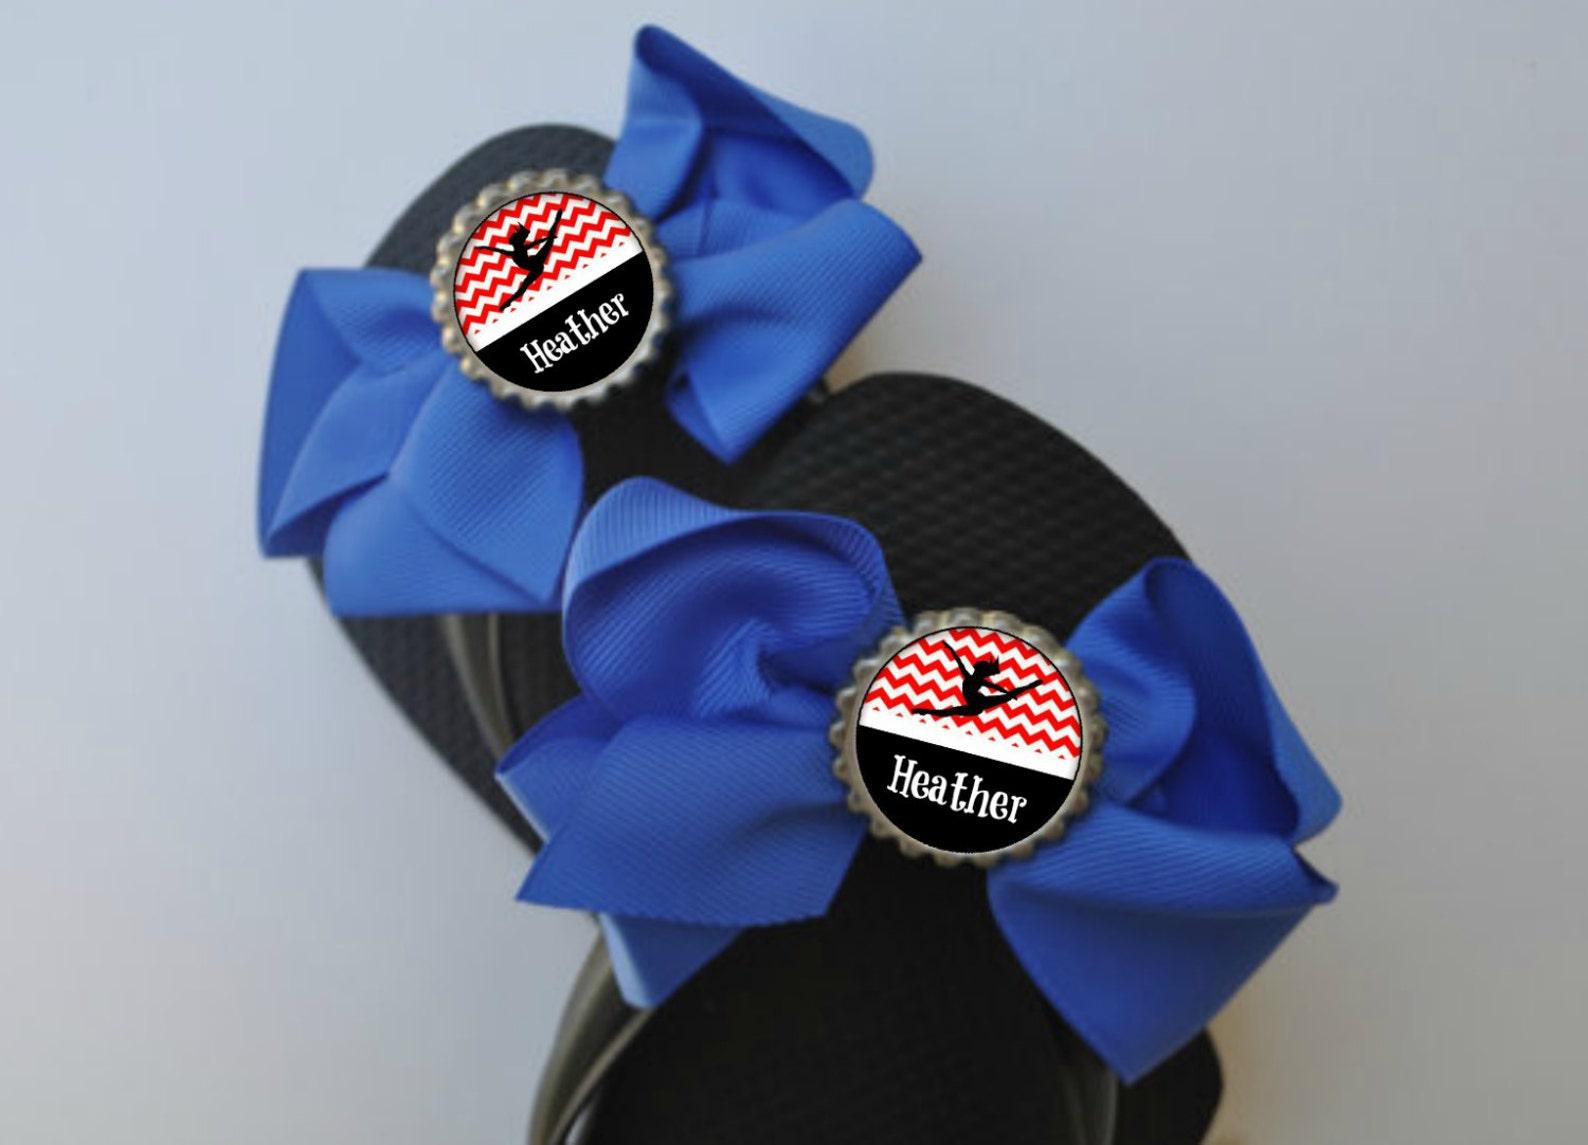 personalized blue & red dance flip flop bows choose colors dance gift shoe slides ballet dance class recital gifts dance team re